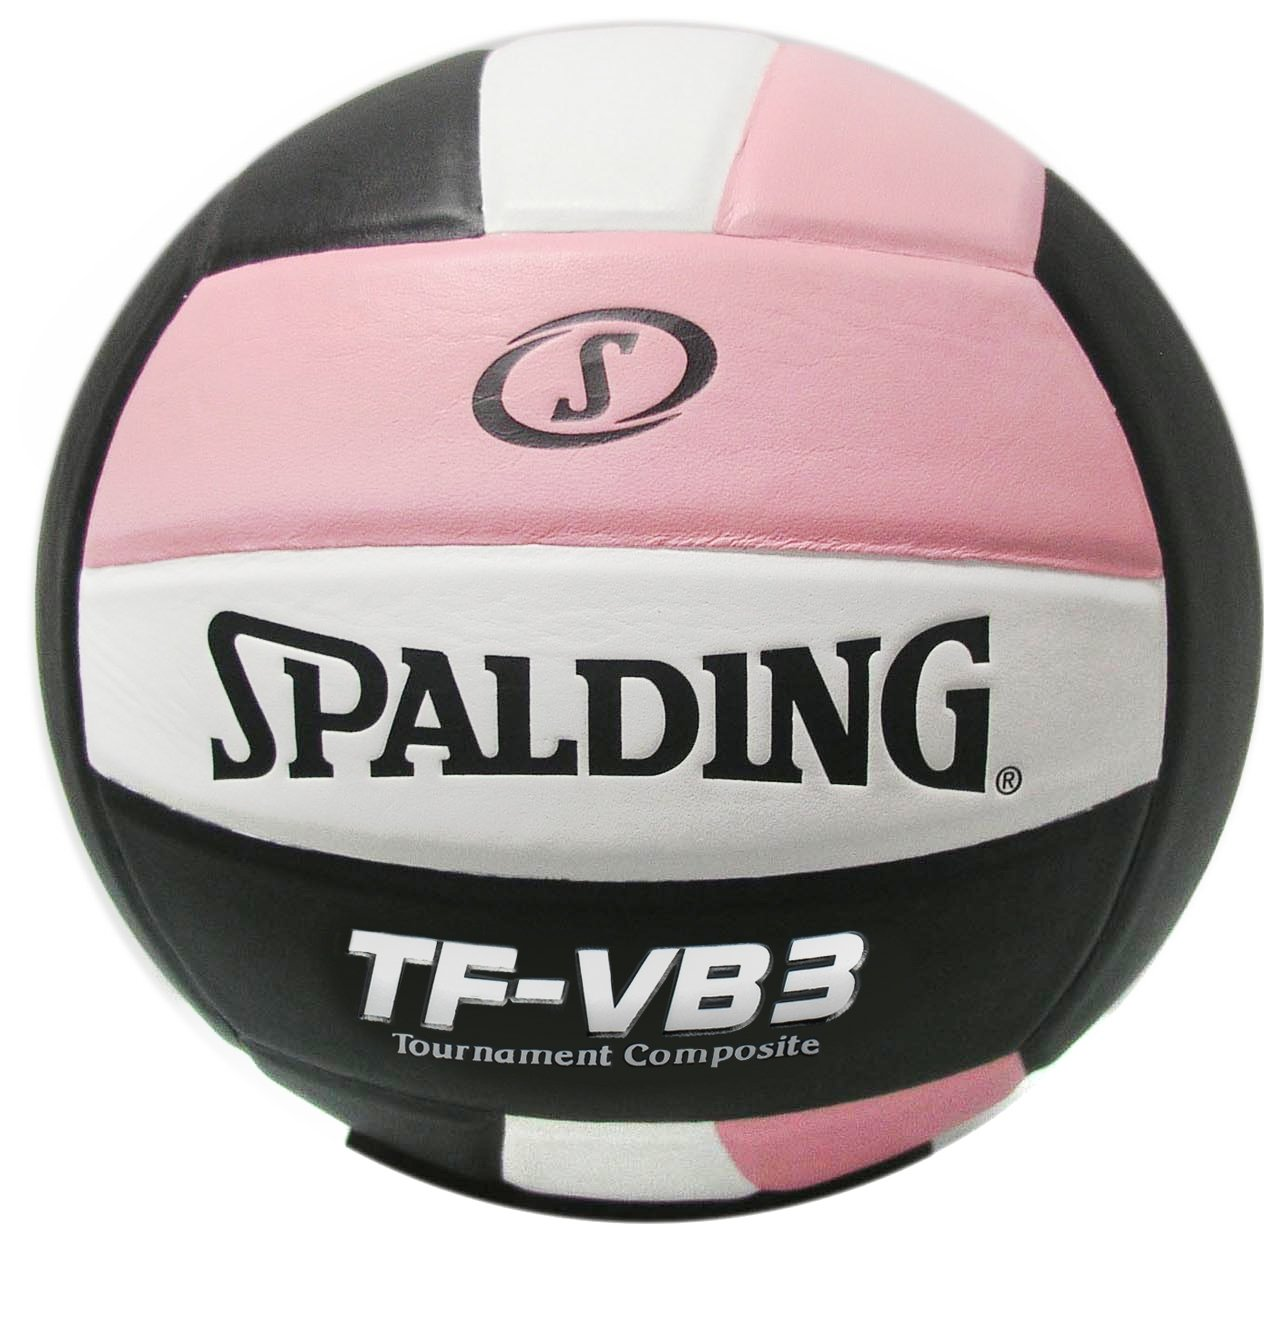 Spalding TF-VB3 ピンク/ブラック/ホワイト